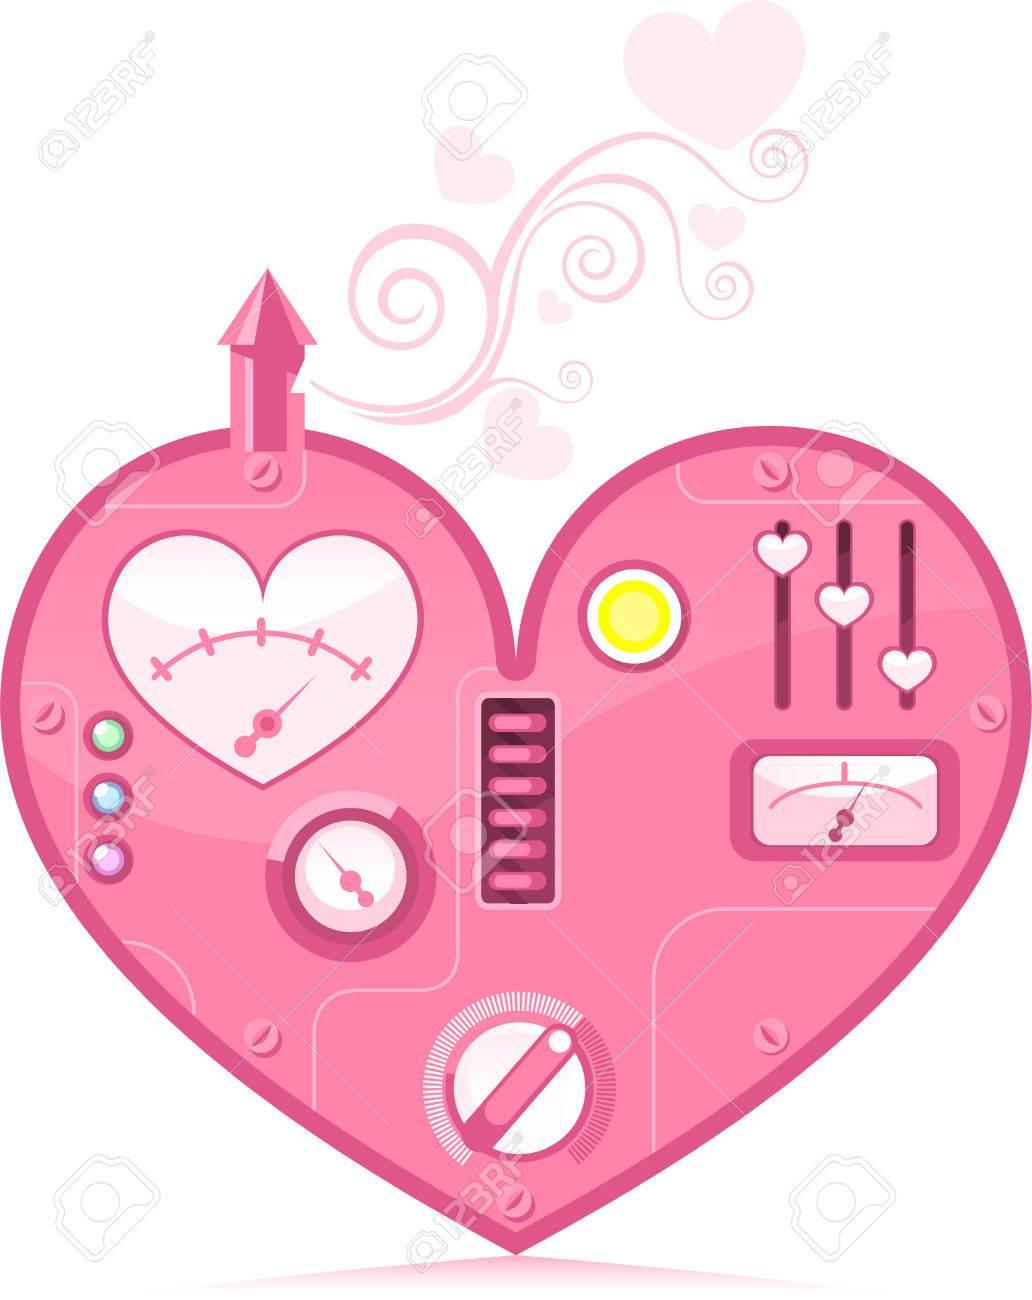 Cute pink loving heart machine expressing love vector illustration cute pink loving heart machine expressing love vector illustration stock vector 33983328 buycottarizona Images